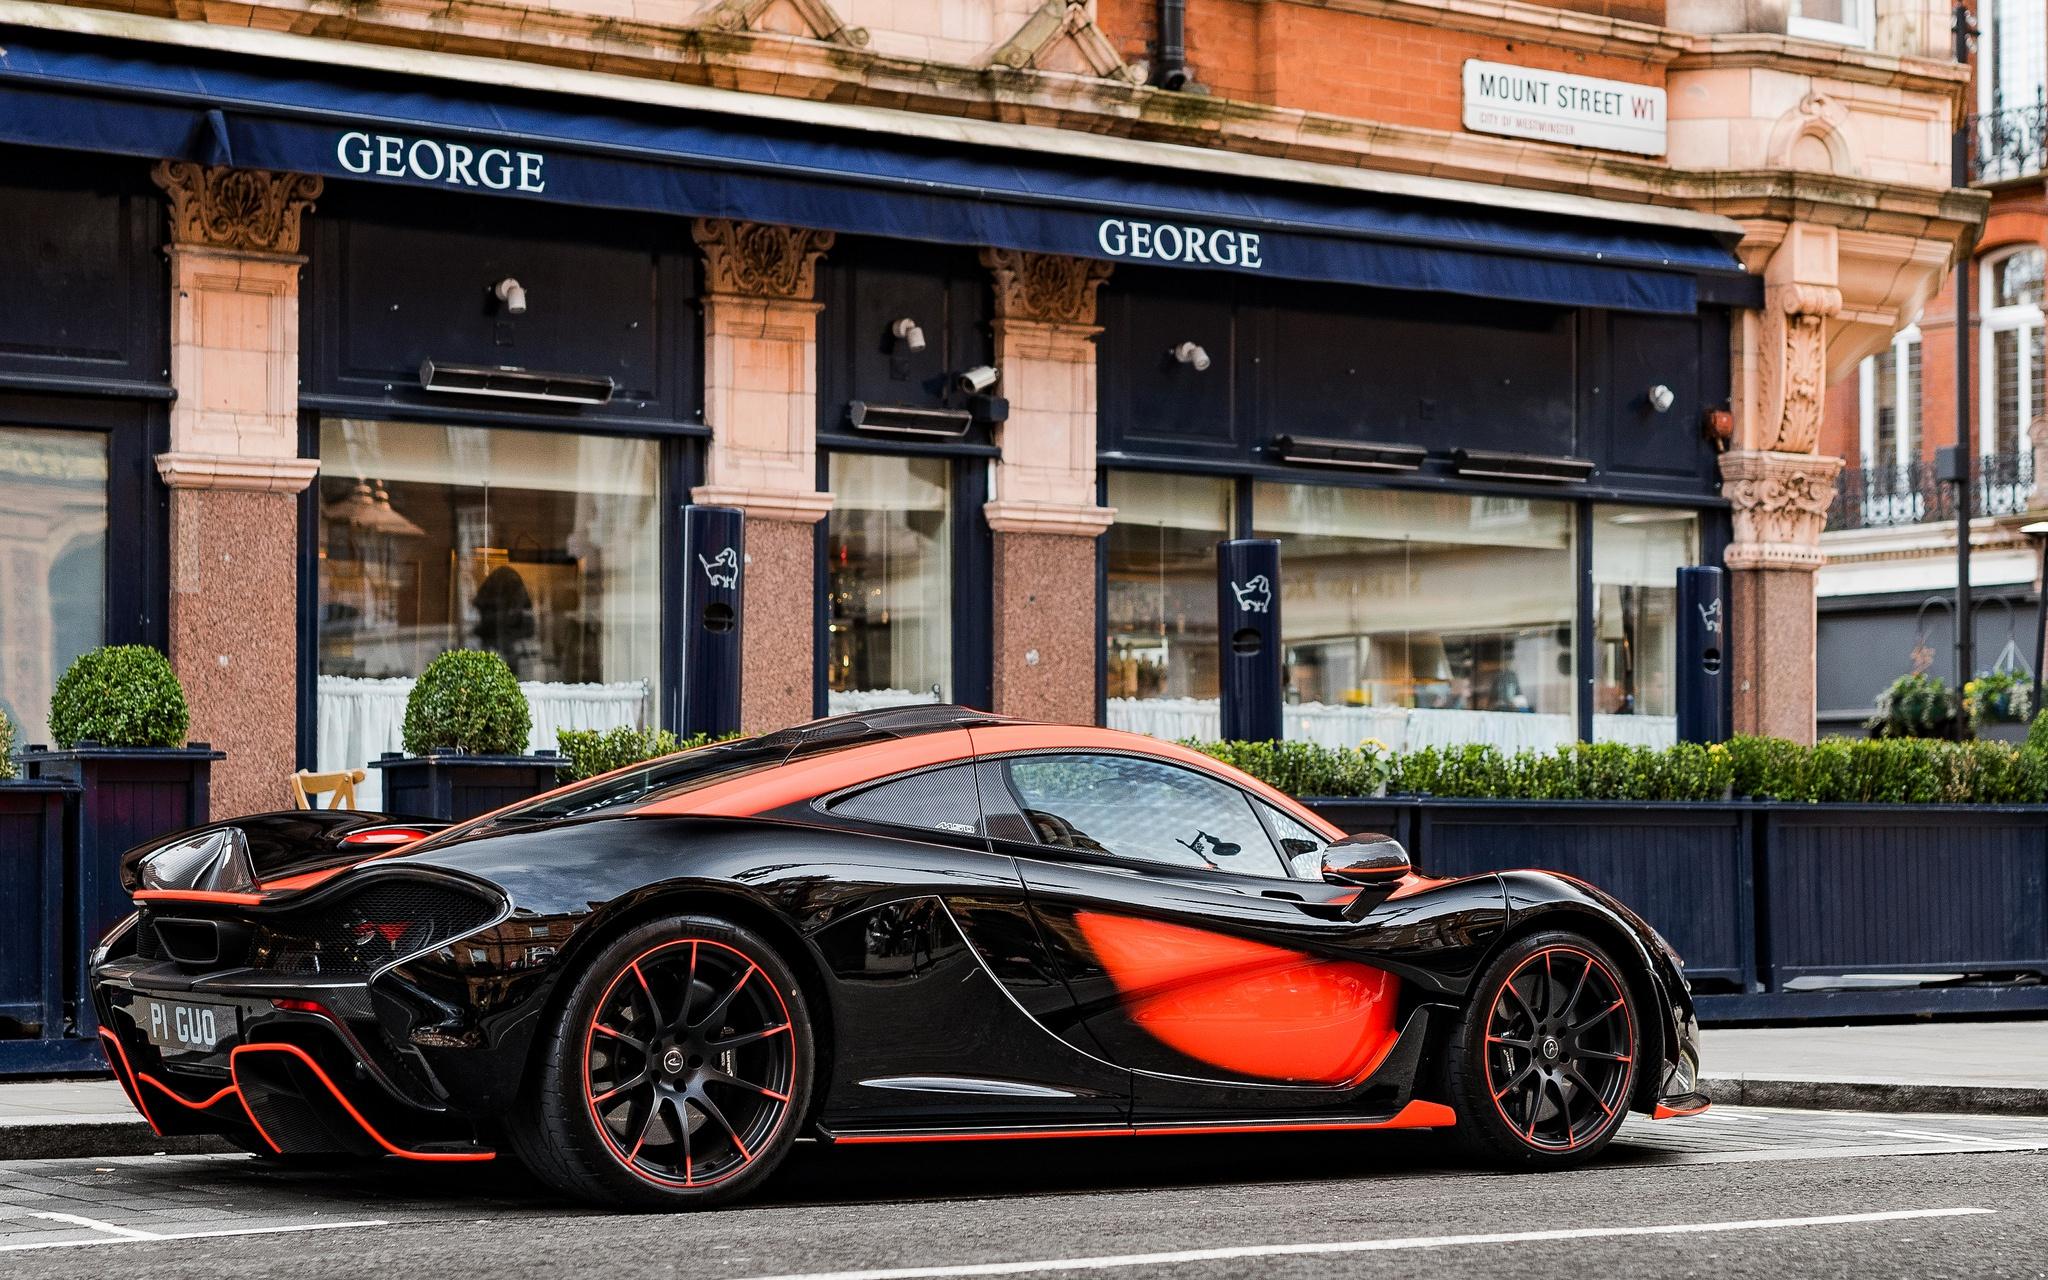 Black Car Car Mclaren Mclaren P1 Sport Car Supercar Vehicle 2048x1280